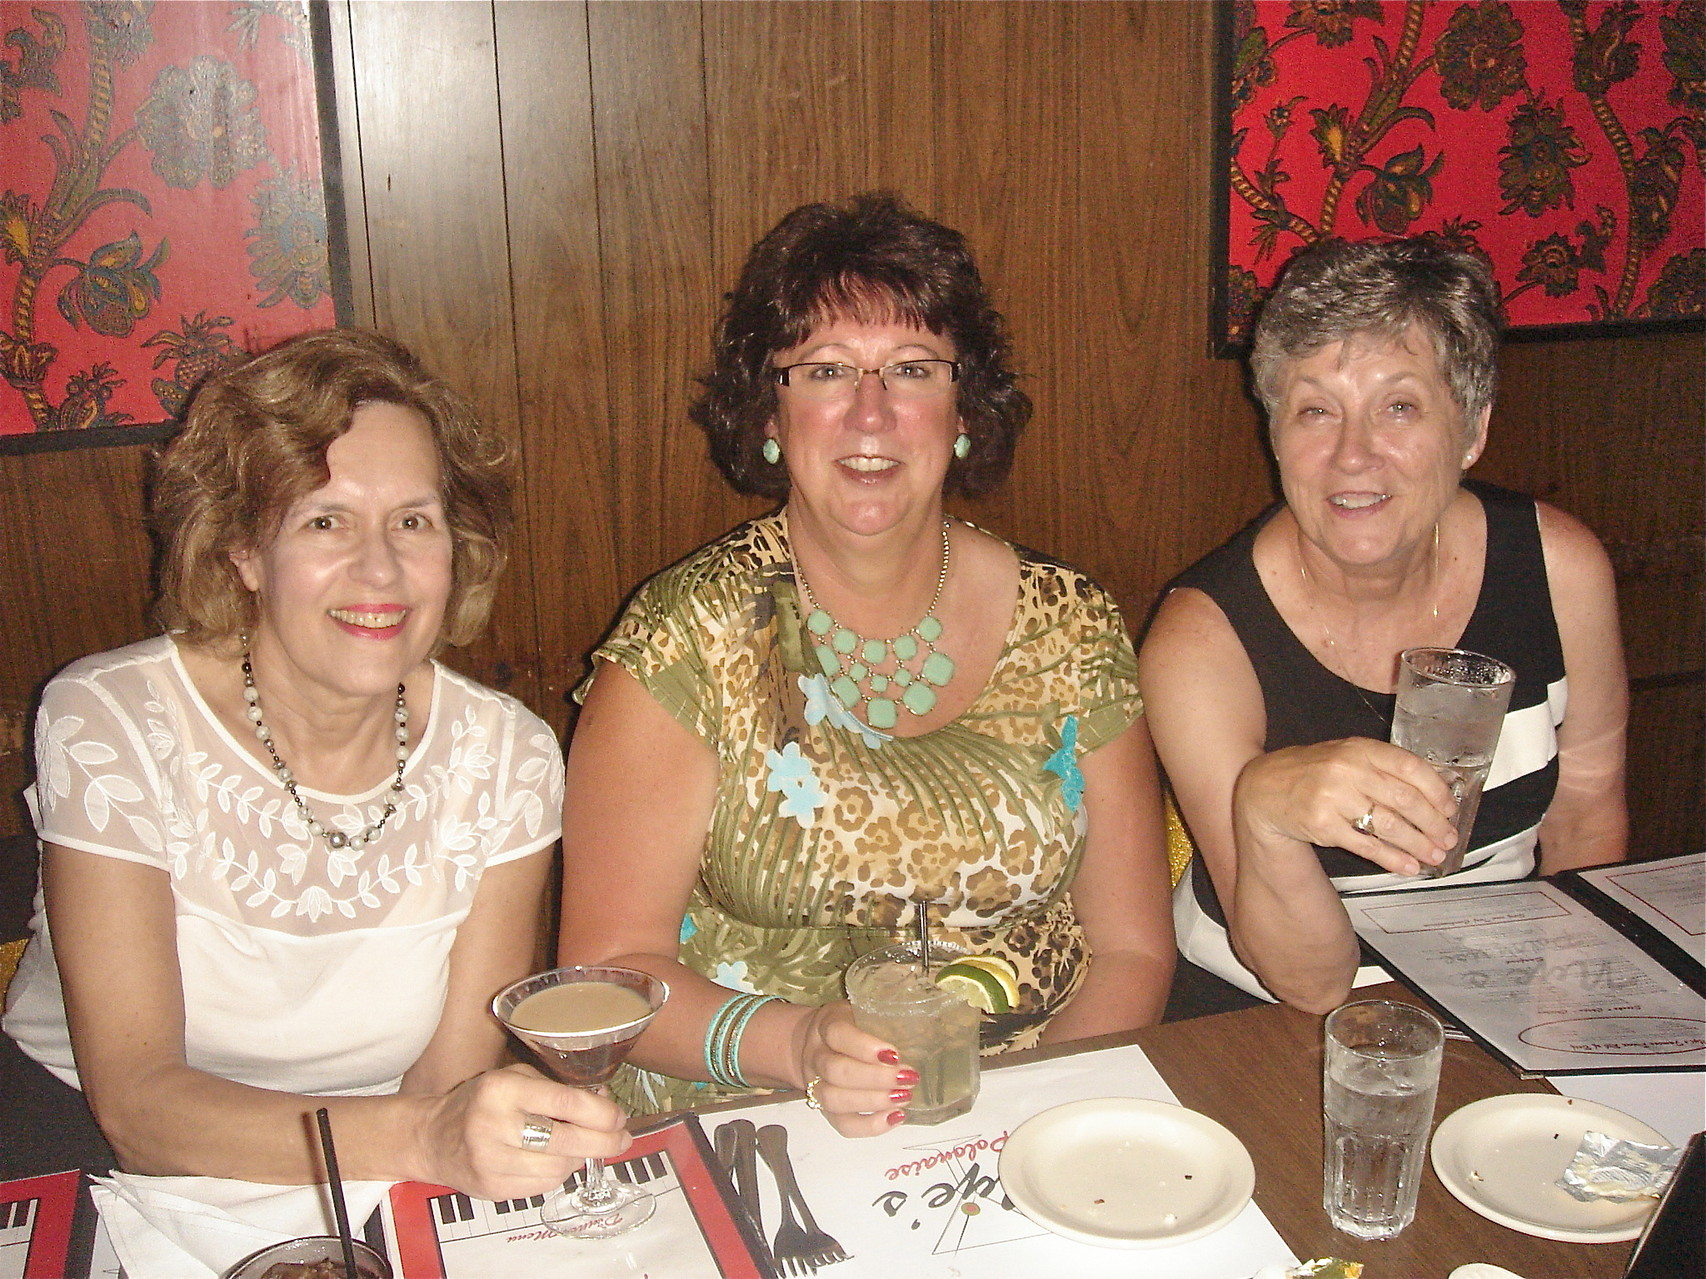 Lorraine Gudas, Jill Wagner, Cindy Wagner; Lorraine has a chocolate martini.